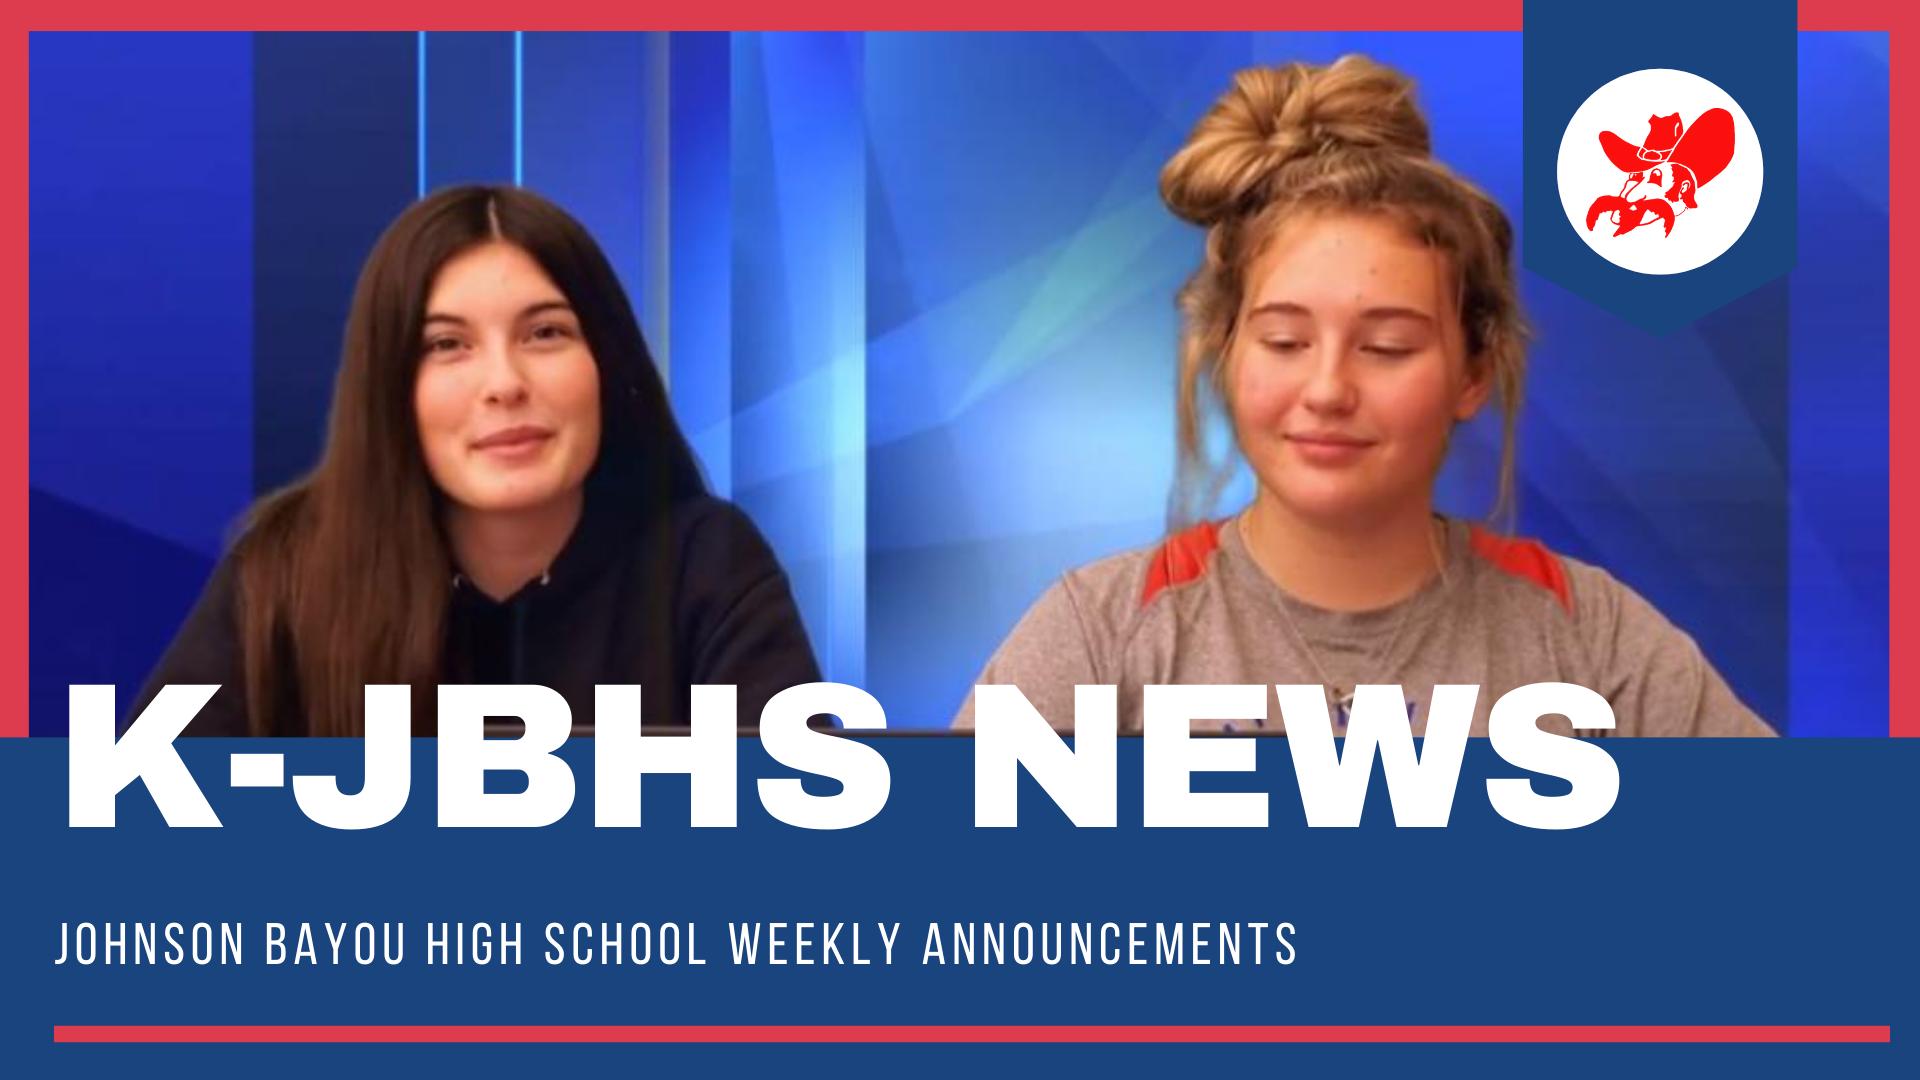 K-JBHS Headline